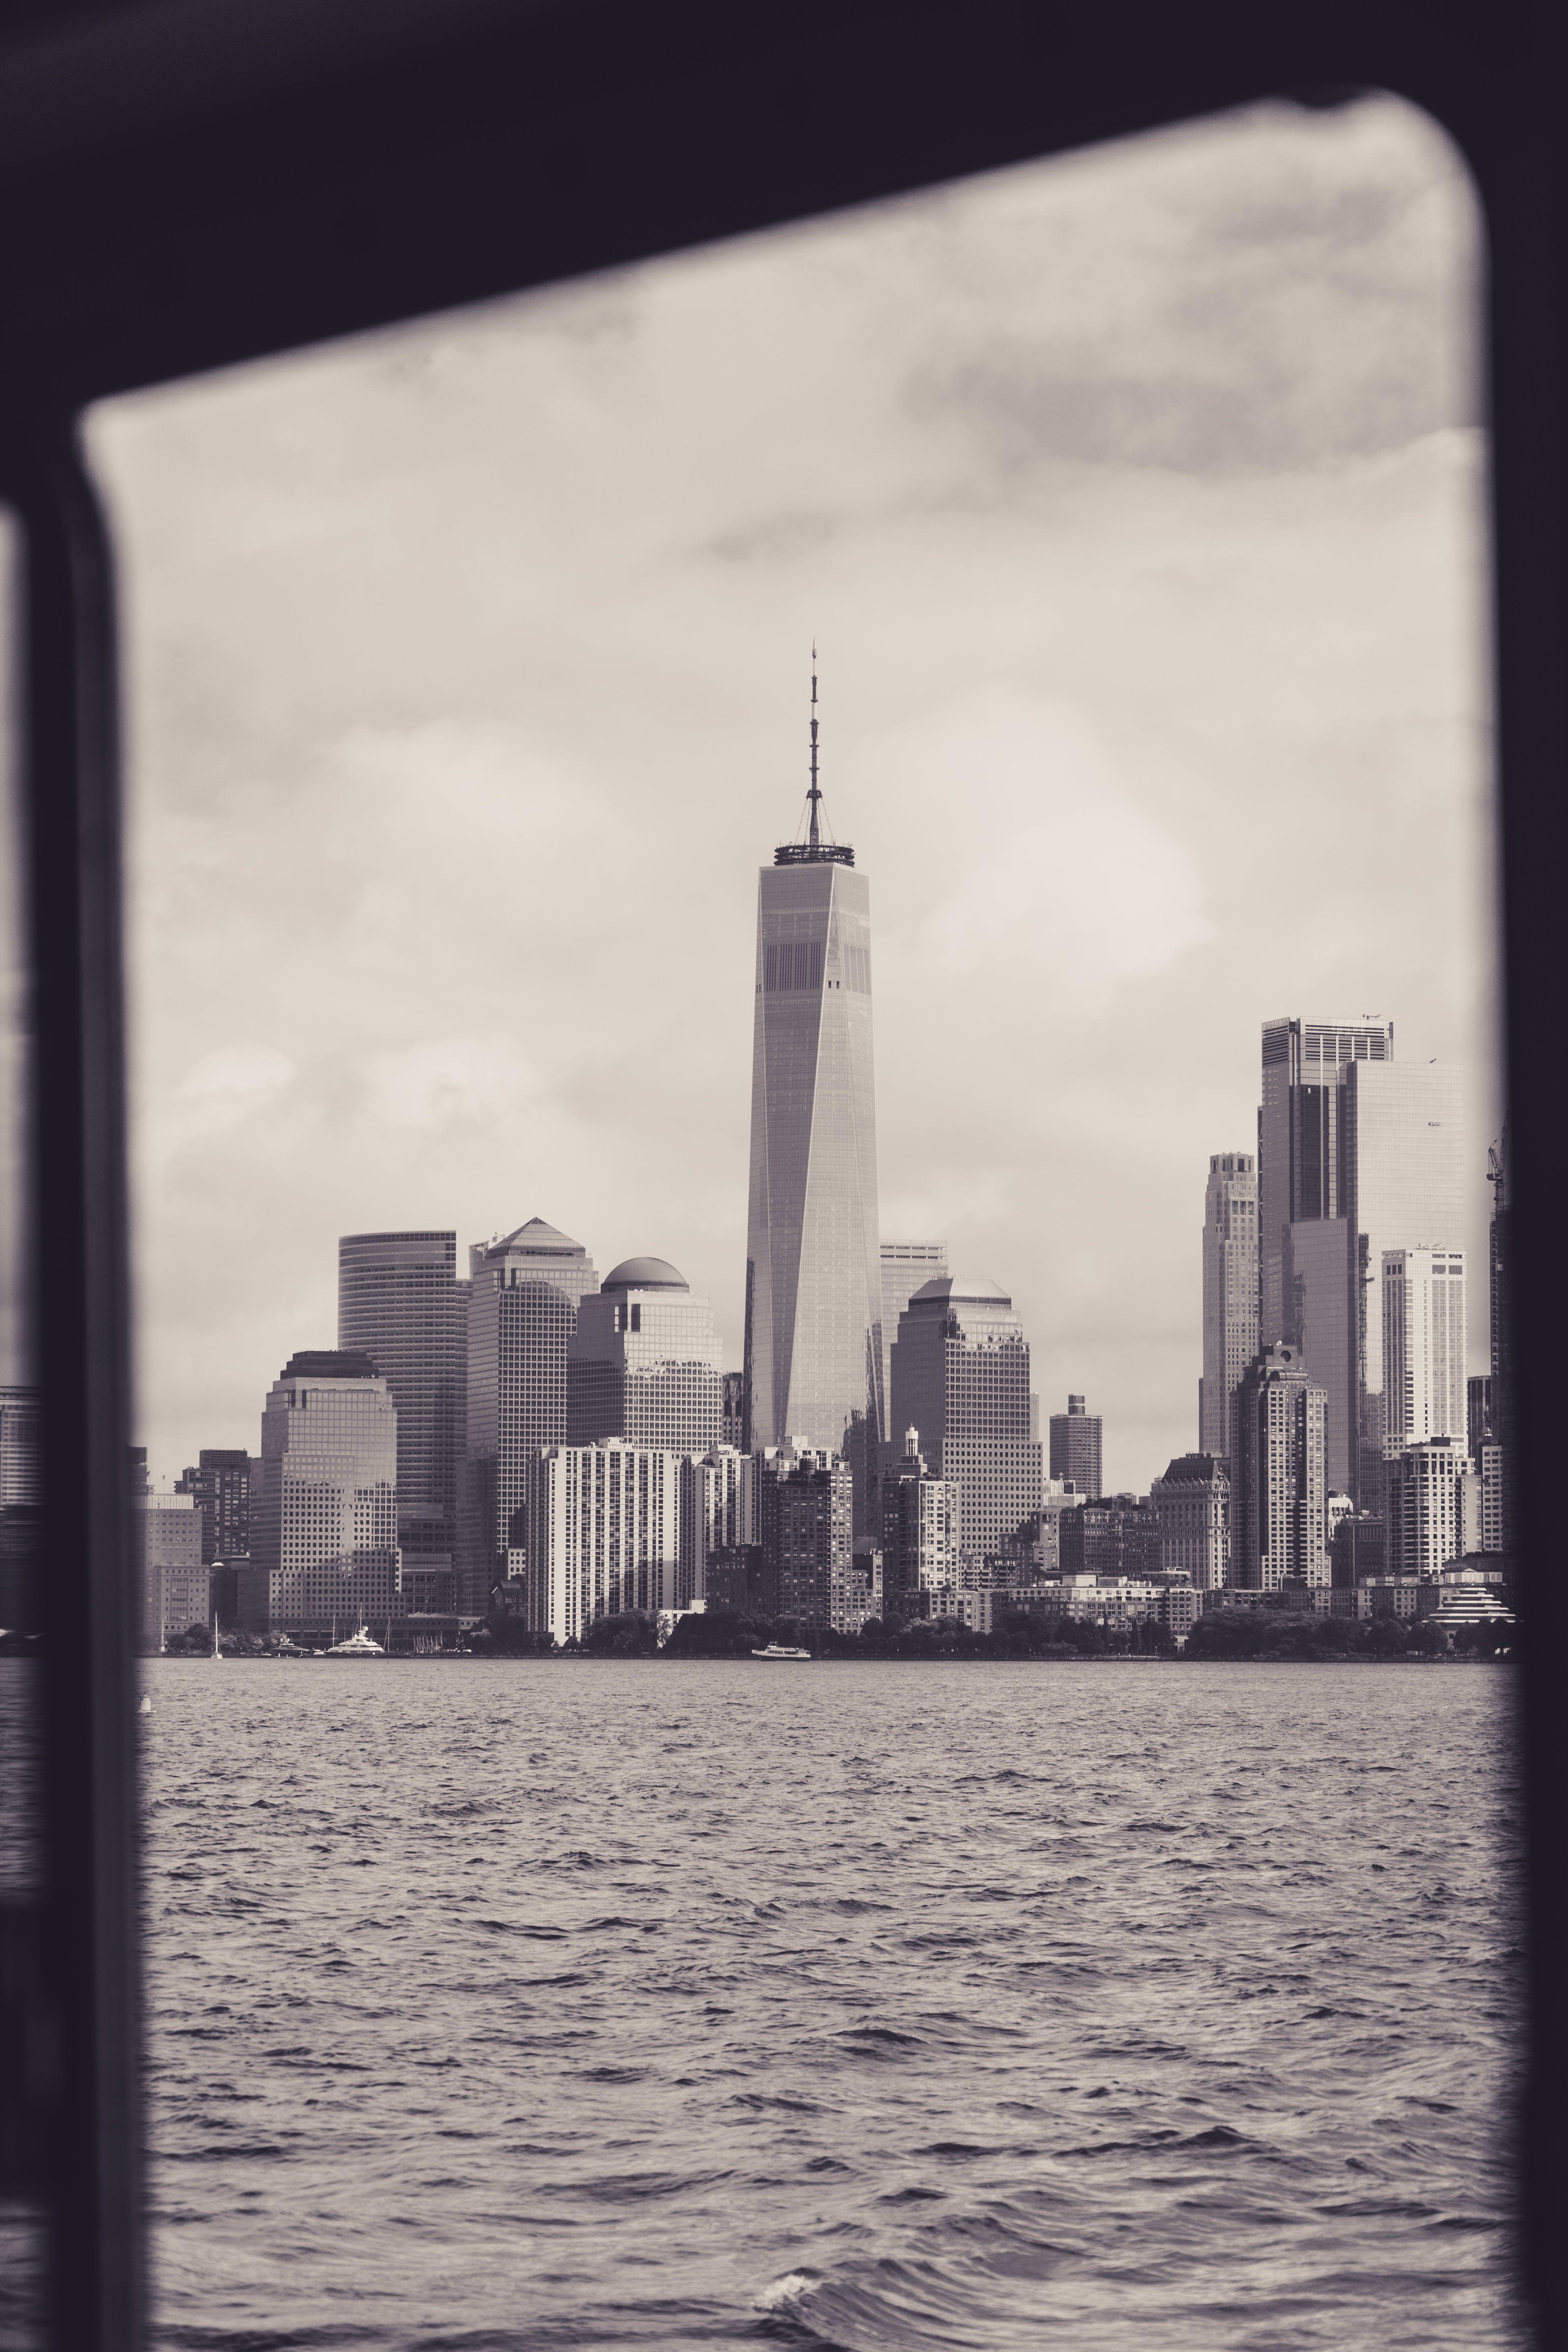 Free stock photo of cityscape, new york city, one world trade center